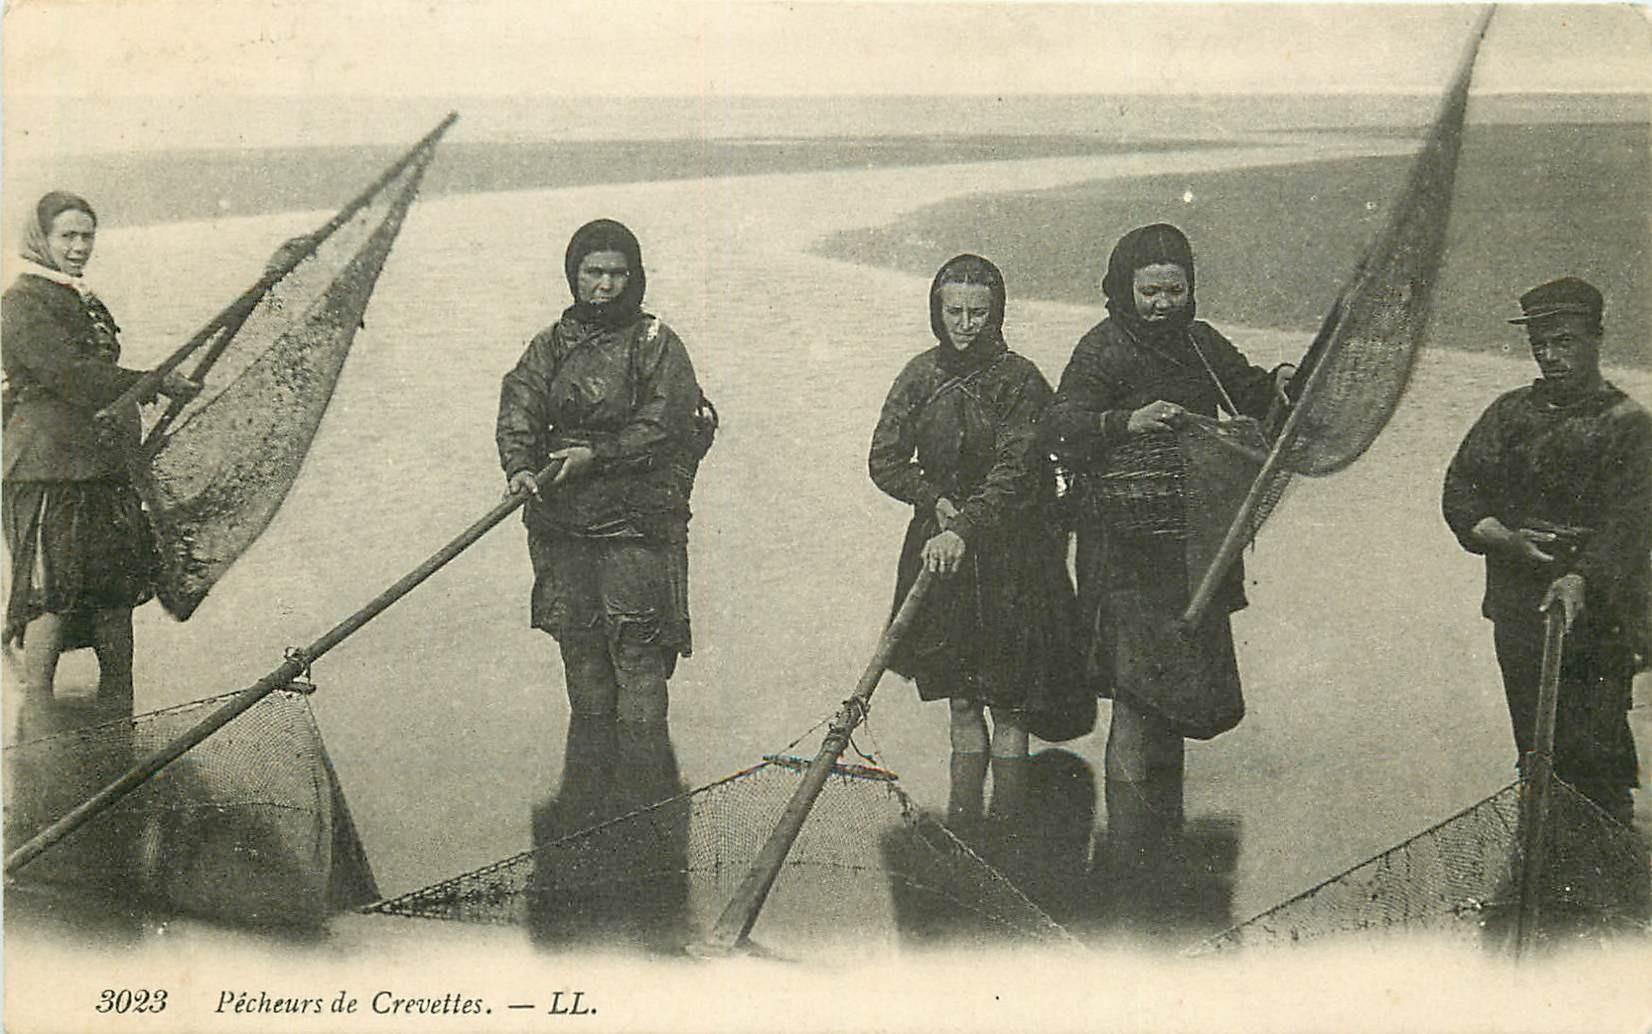 METIERS DE LA MER. Pêcheurs de Crevettes 1923